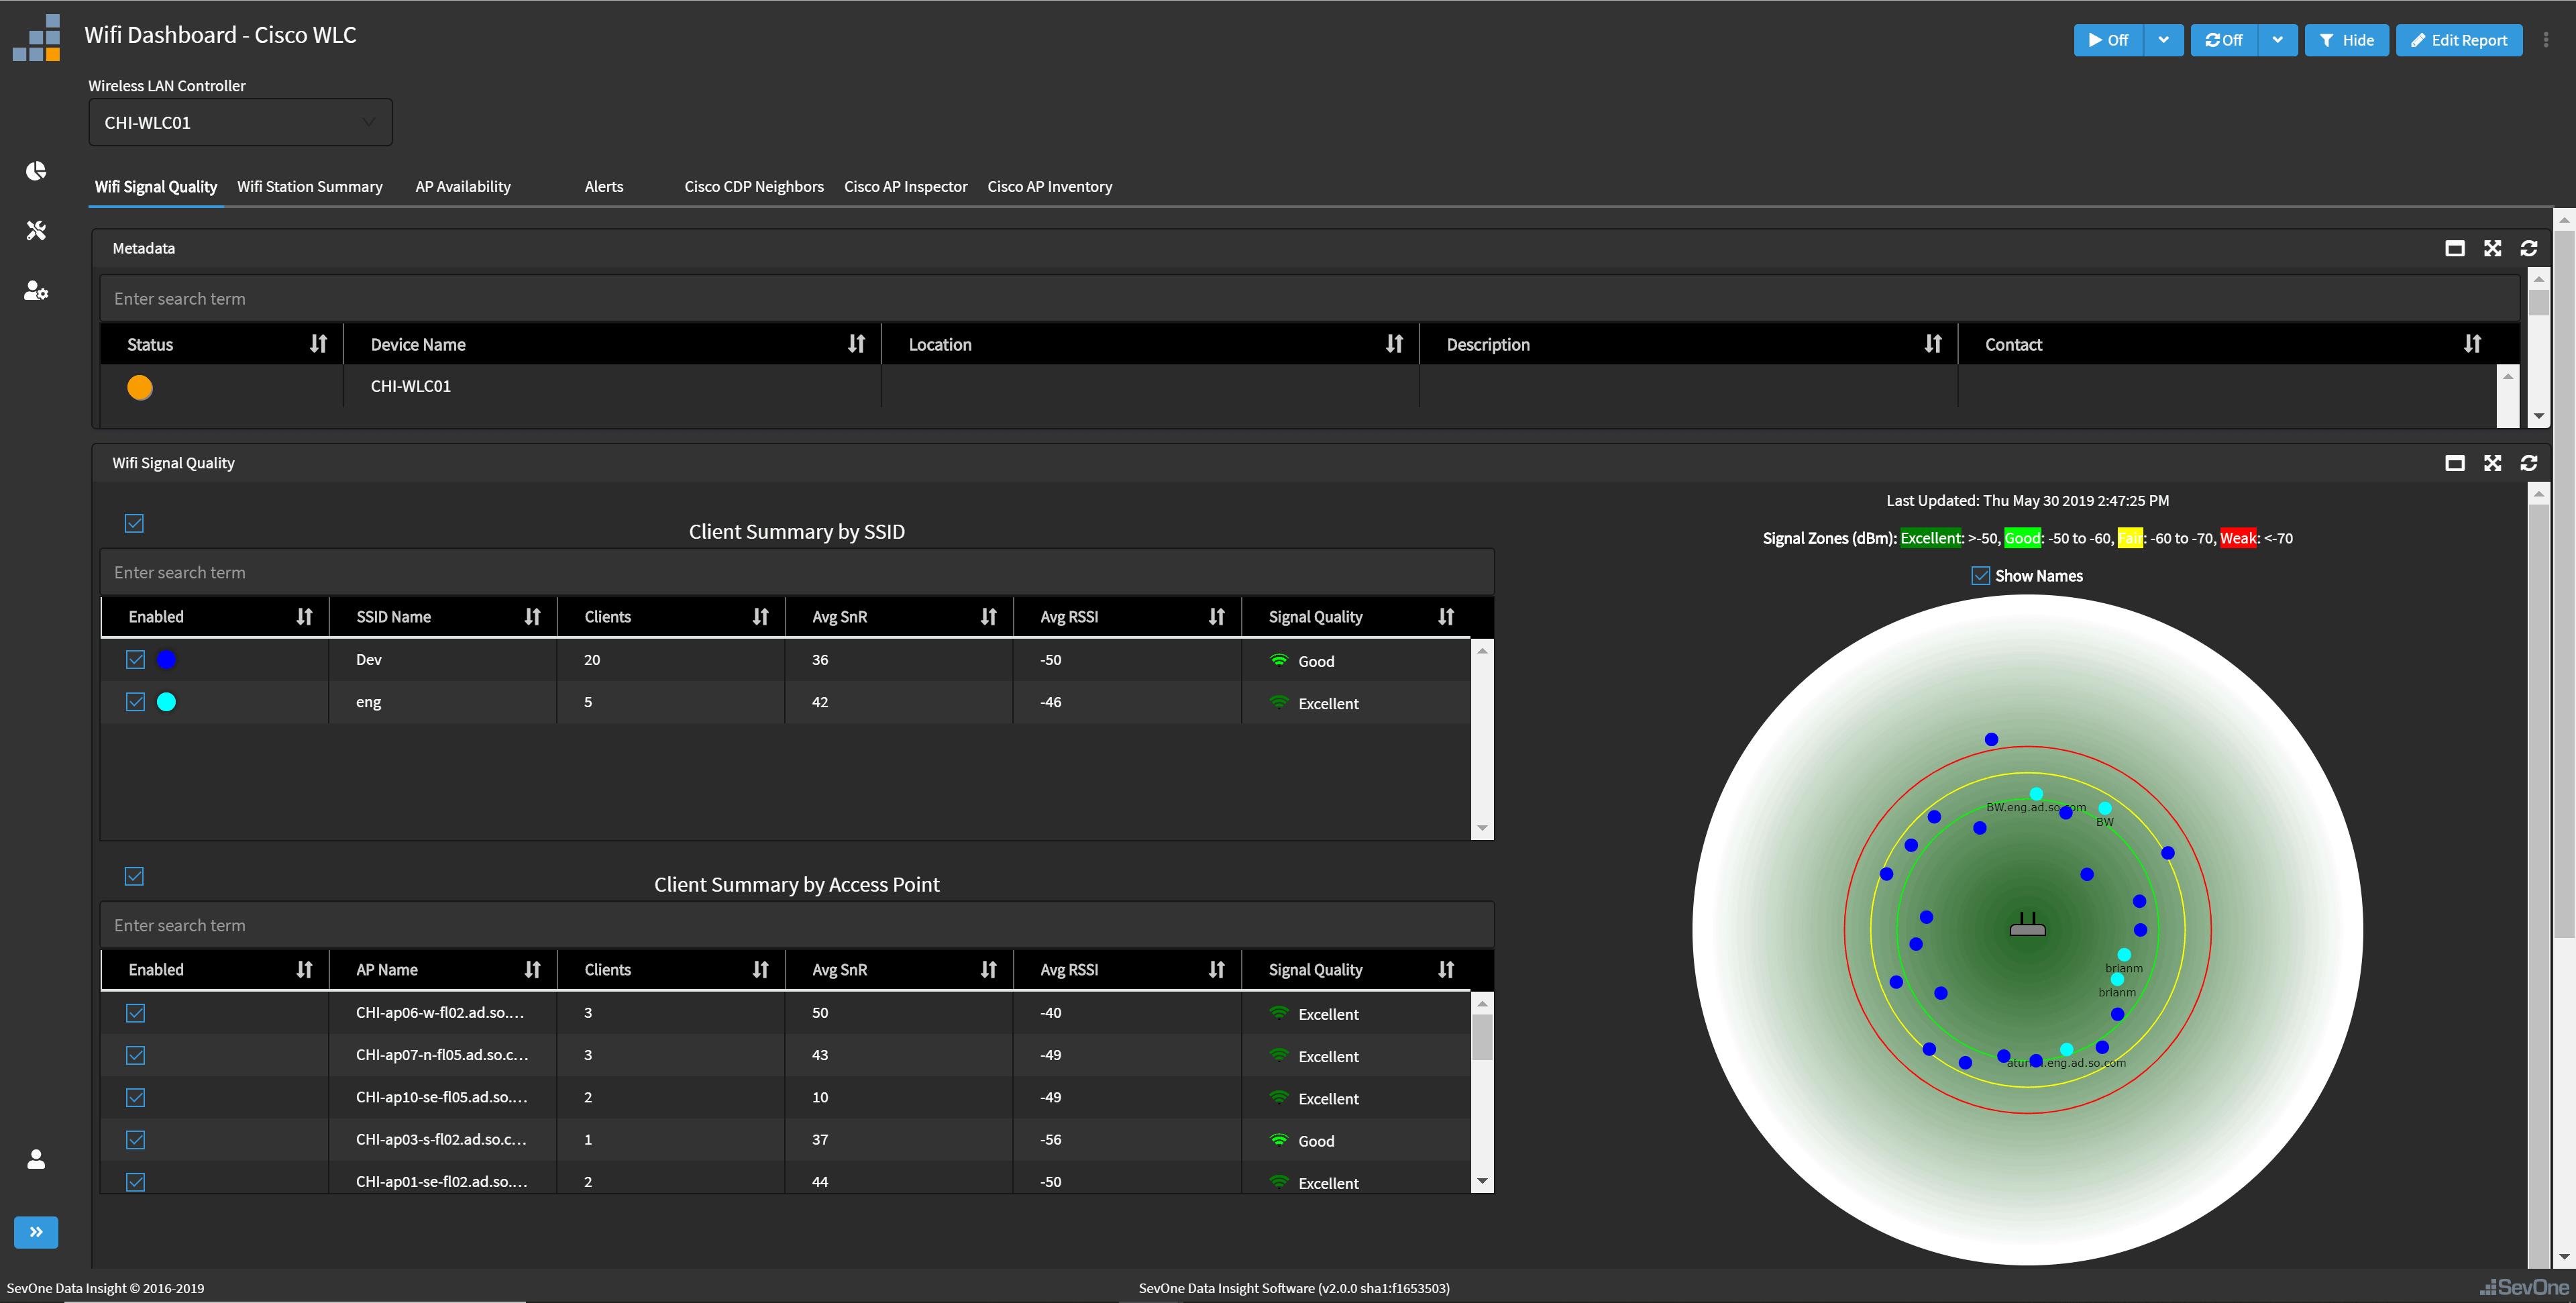 Signal quality